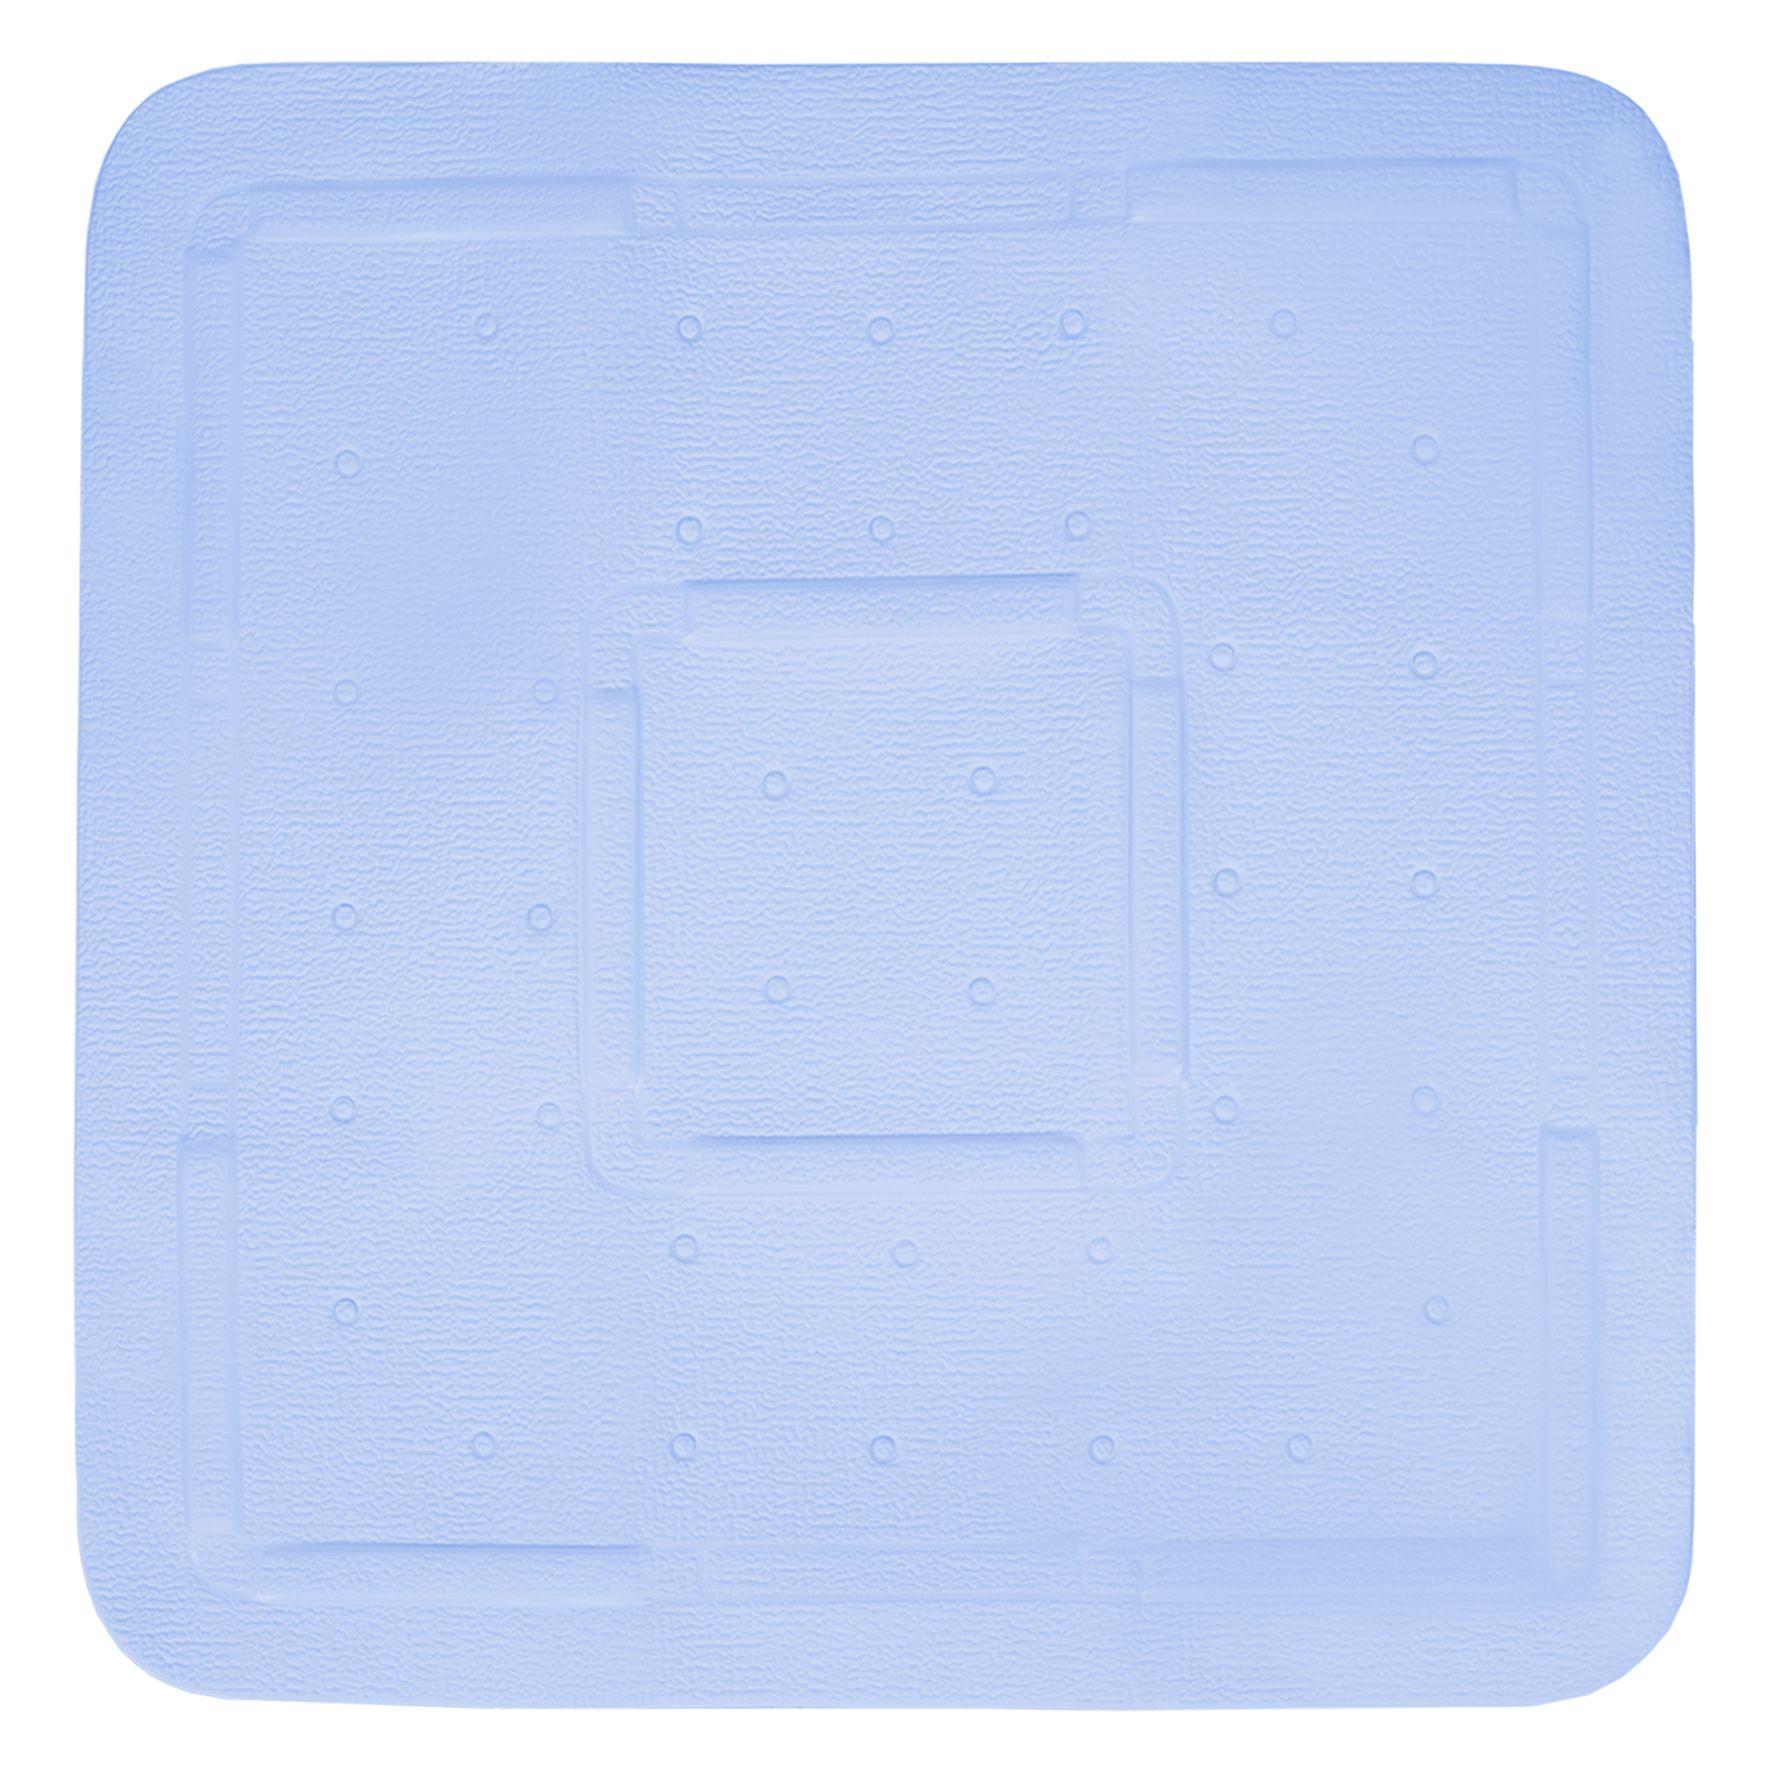 Differnz Tutus antislip douchemat 55x55cm blauw